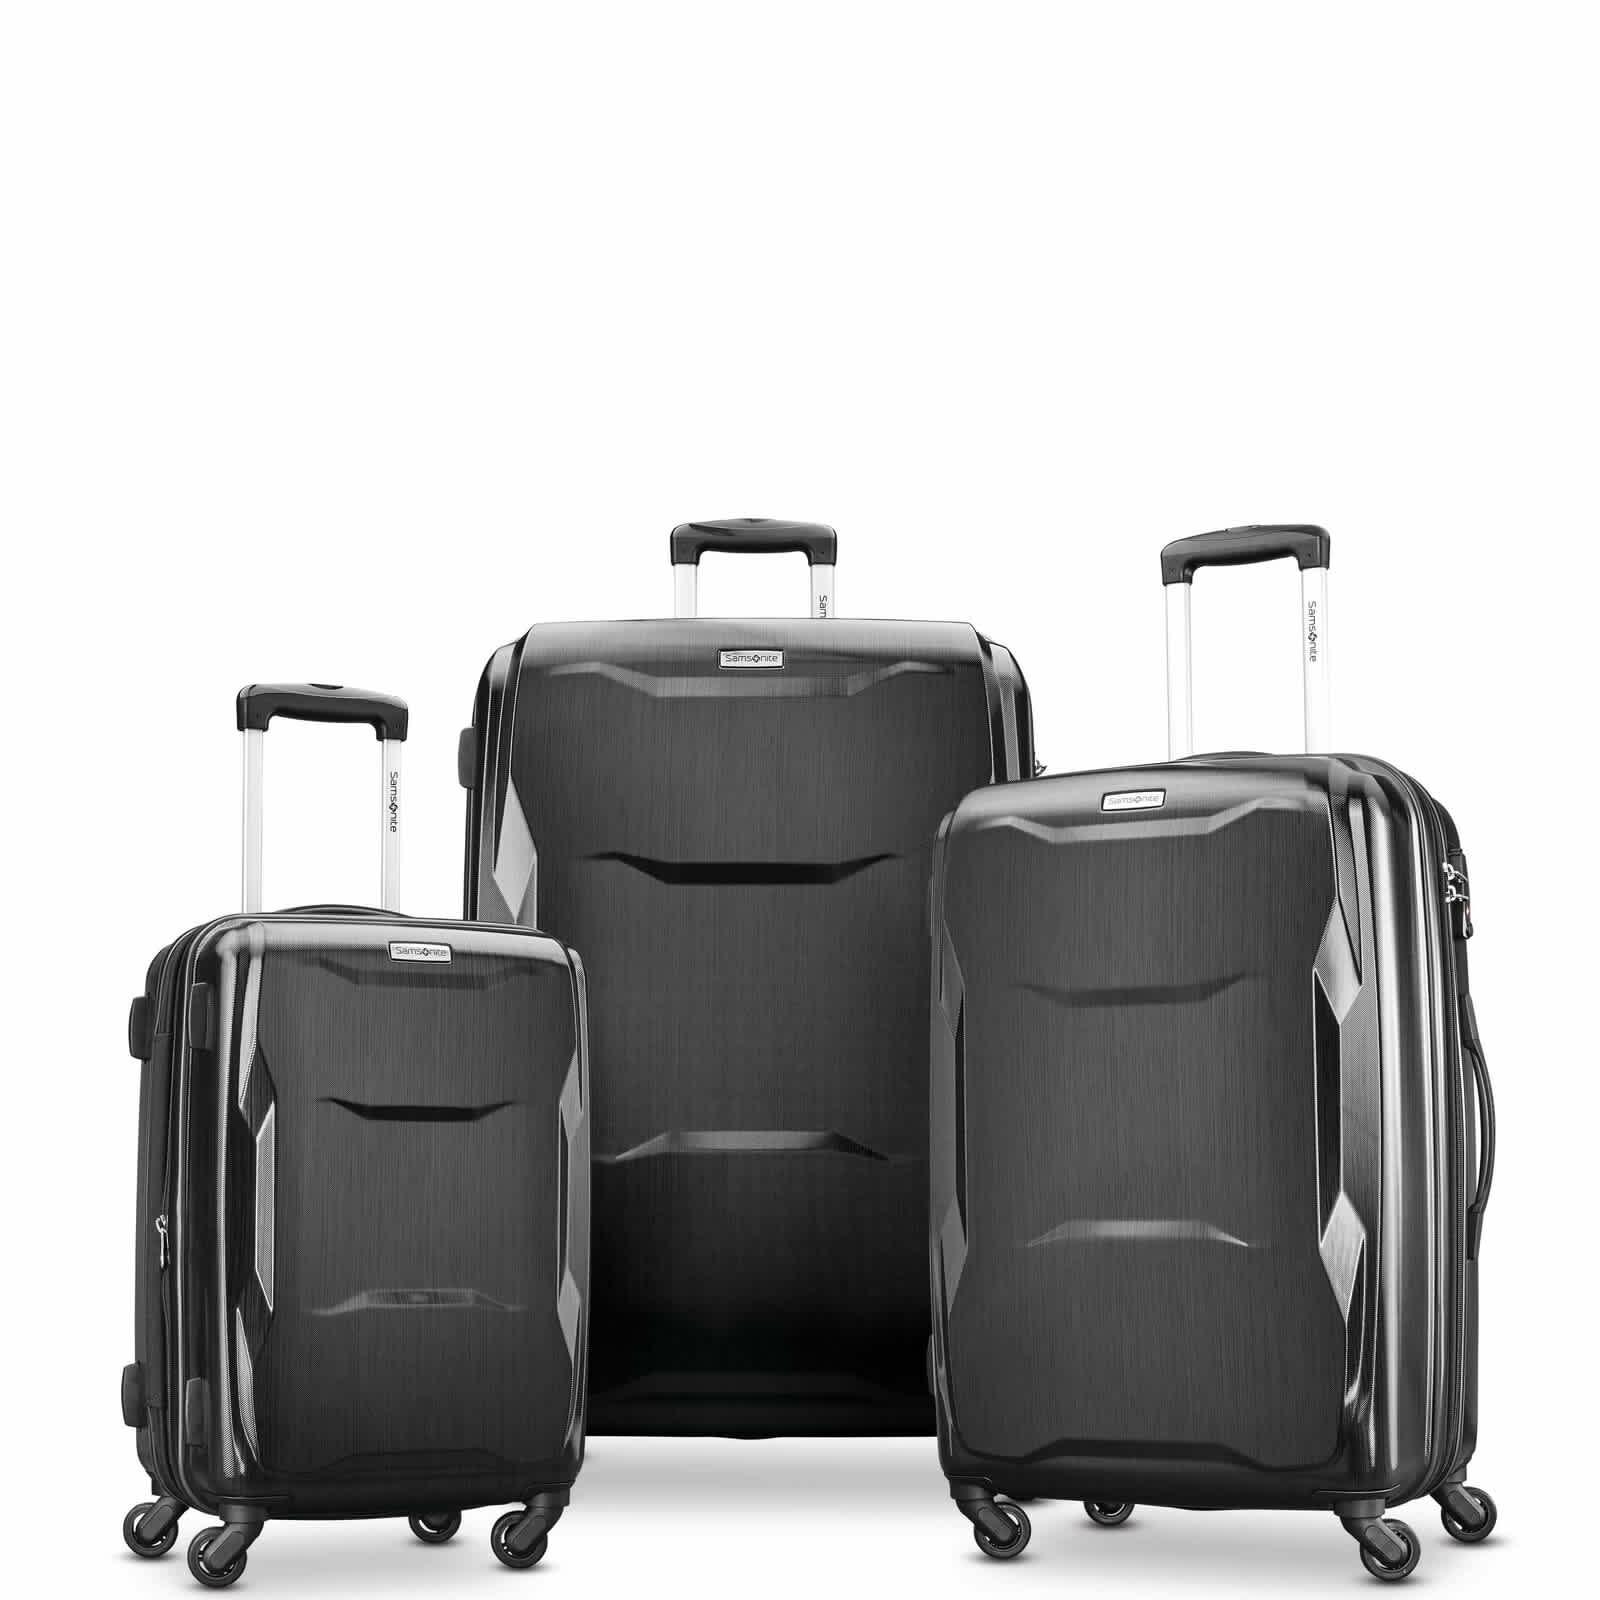 Samsonite Pivot 3-Piece Hardside Spinner Luggage Set